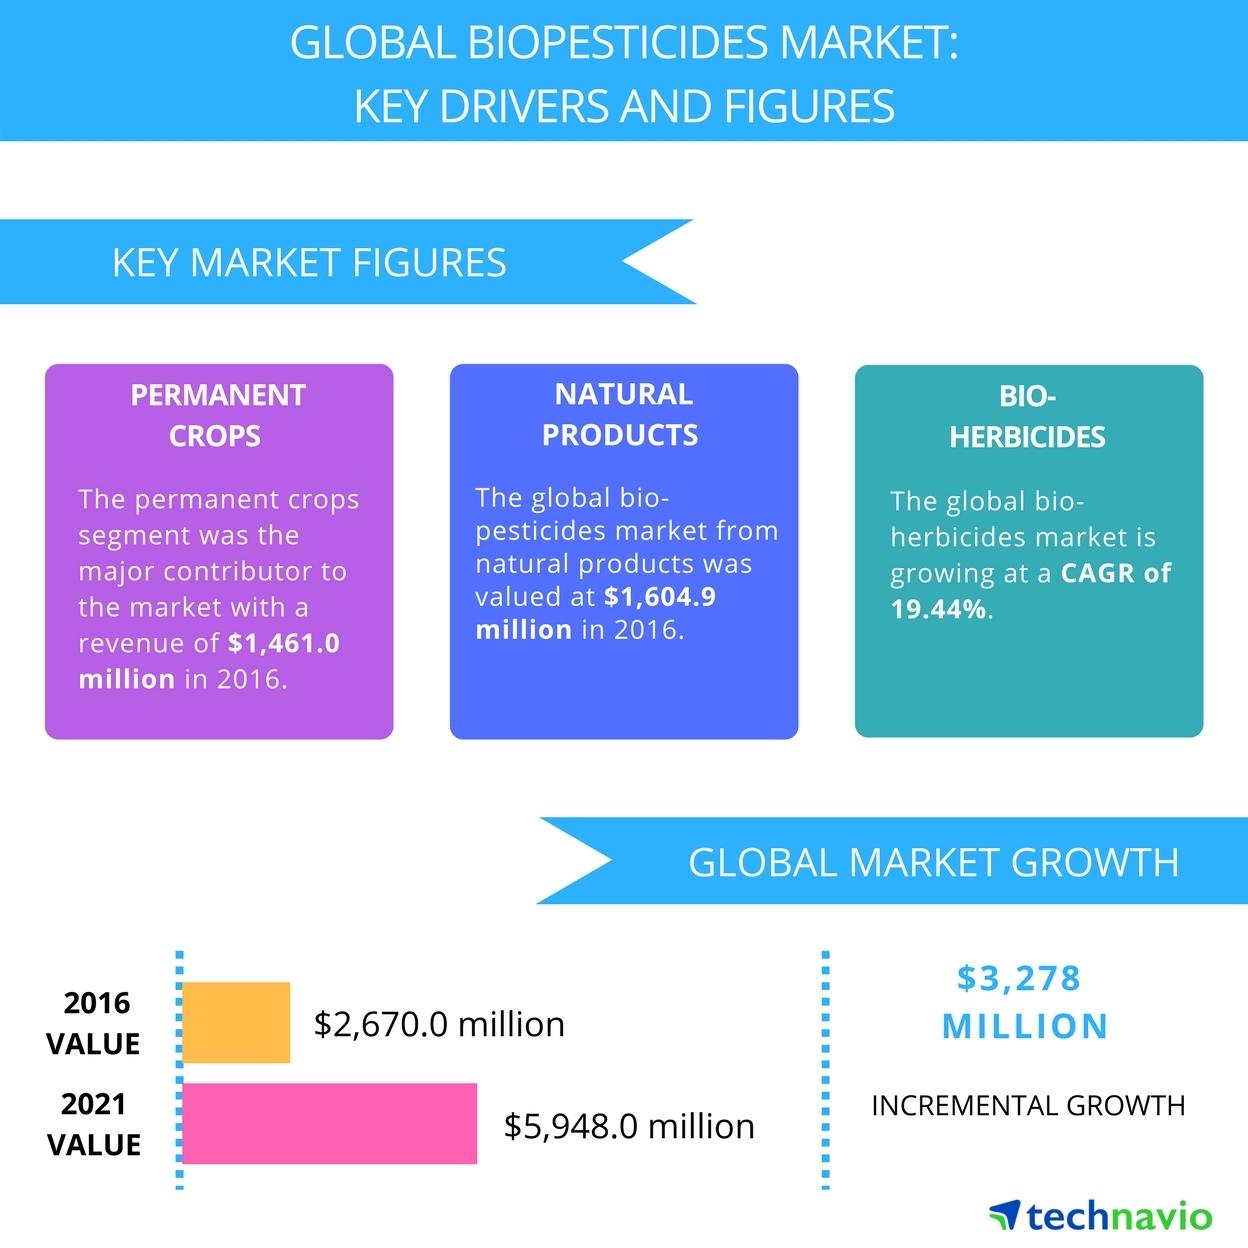 Global Biopesticides Market Industry Survey Forecasts